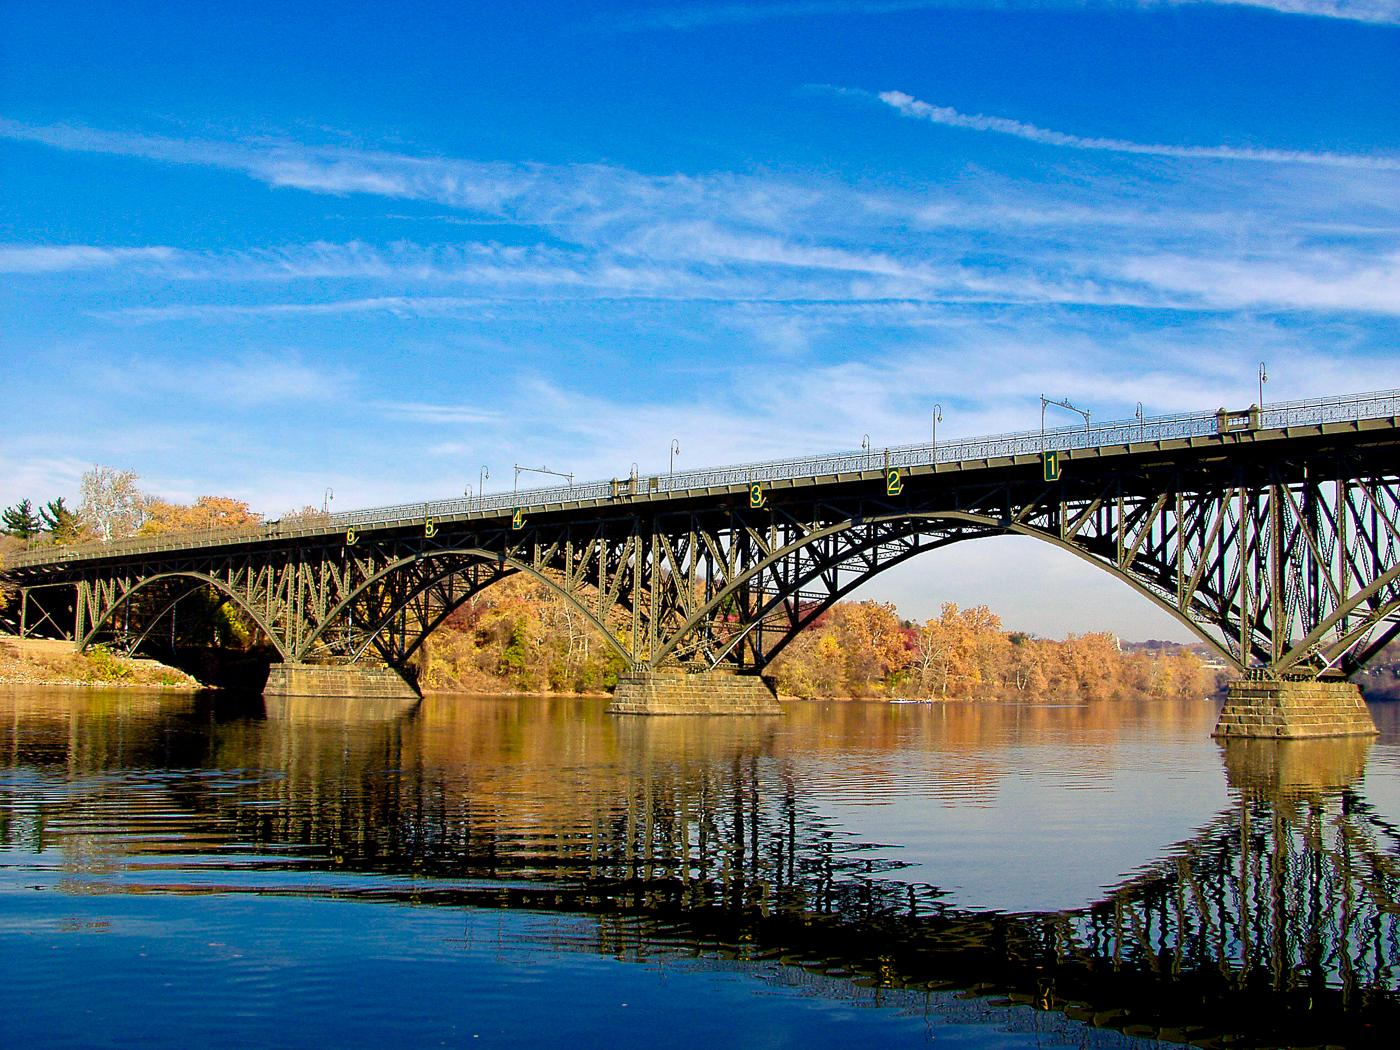 Photograph of the strawberry-mansion-bridge Philadelphia